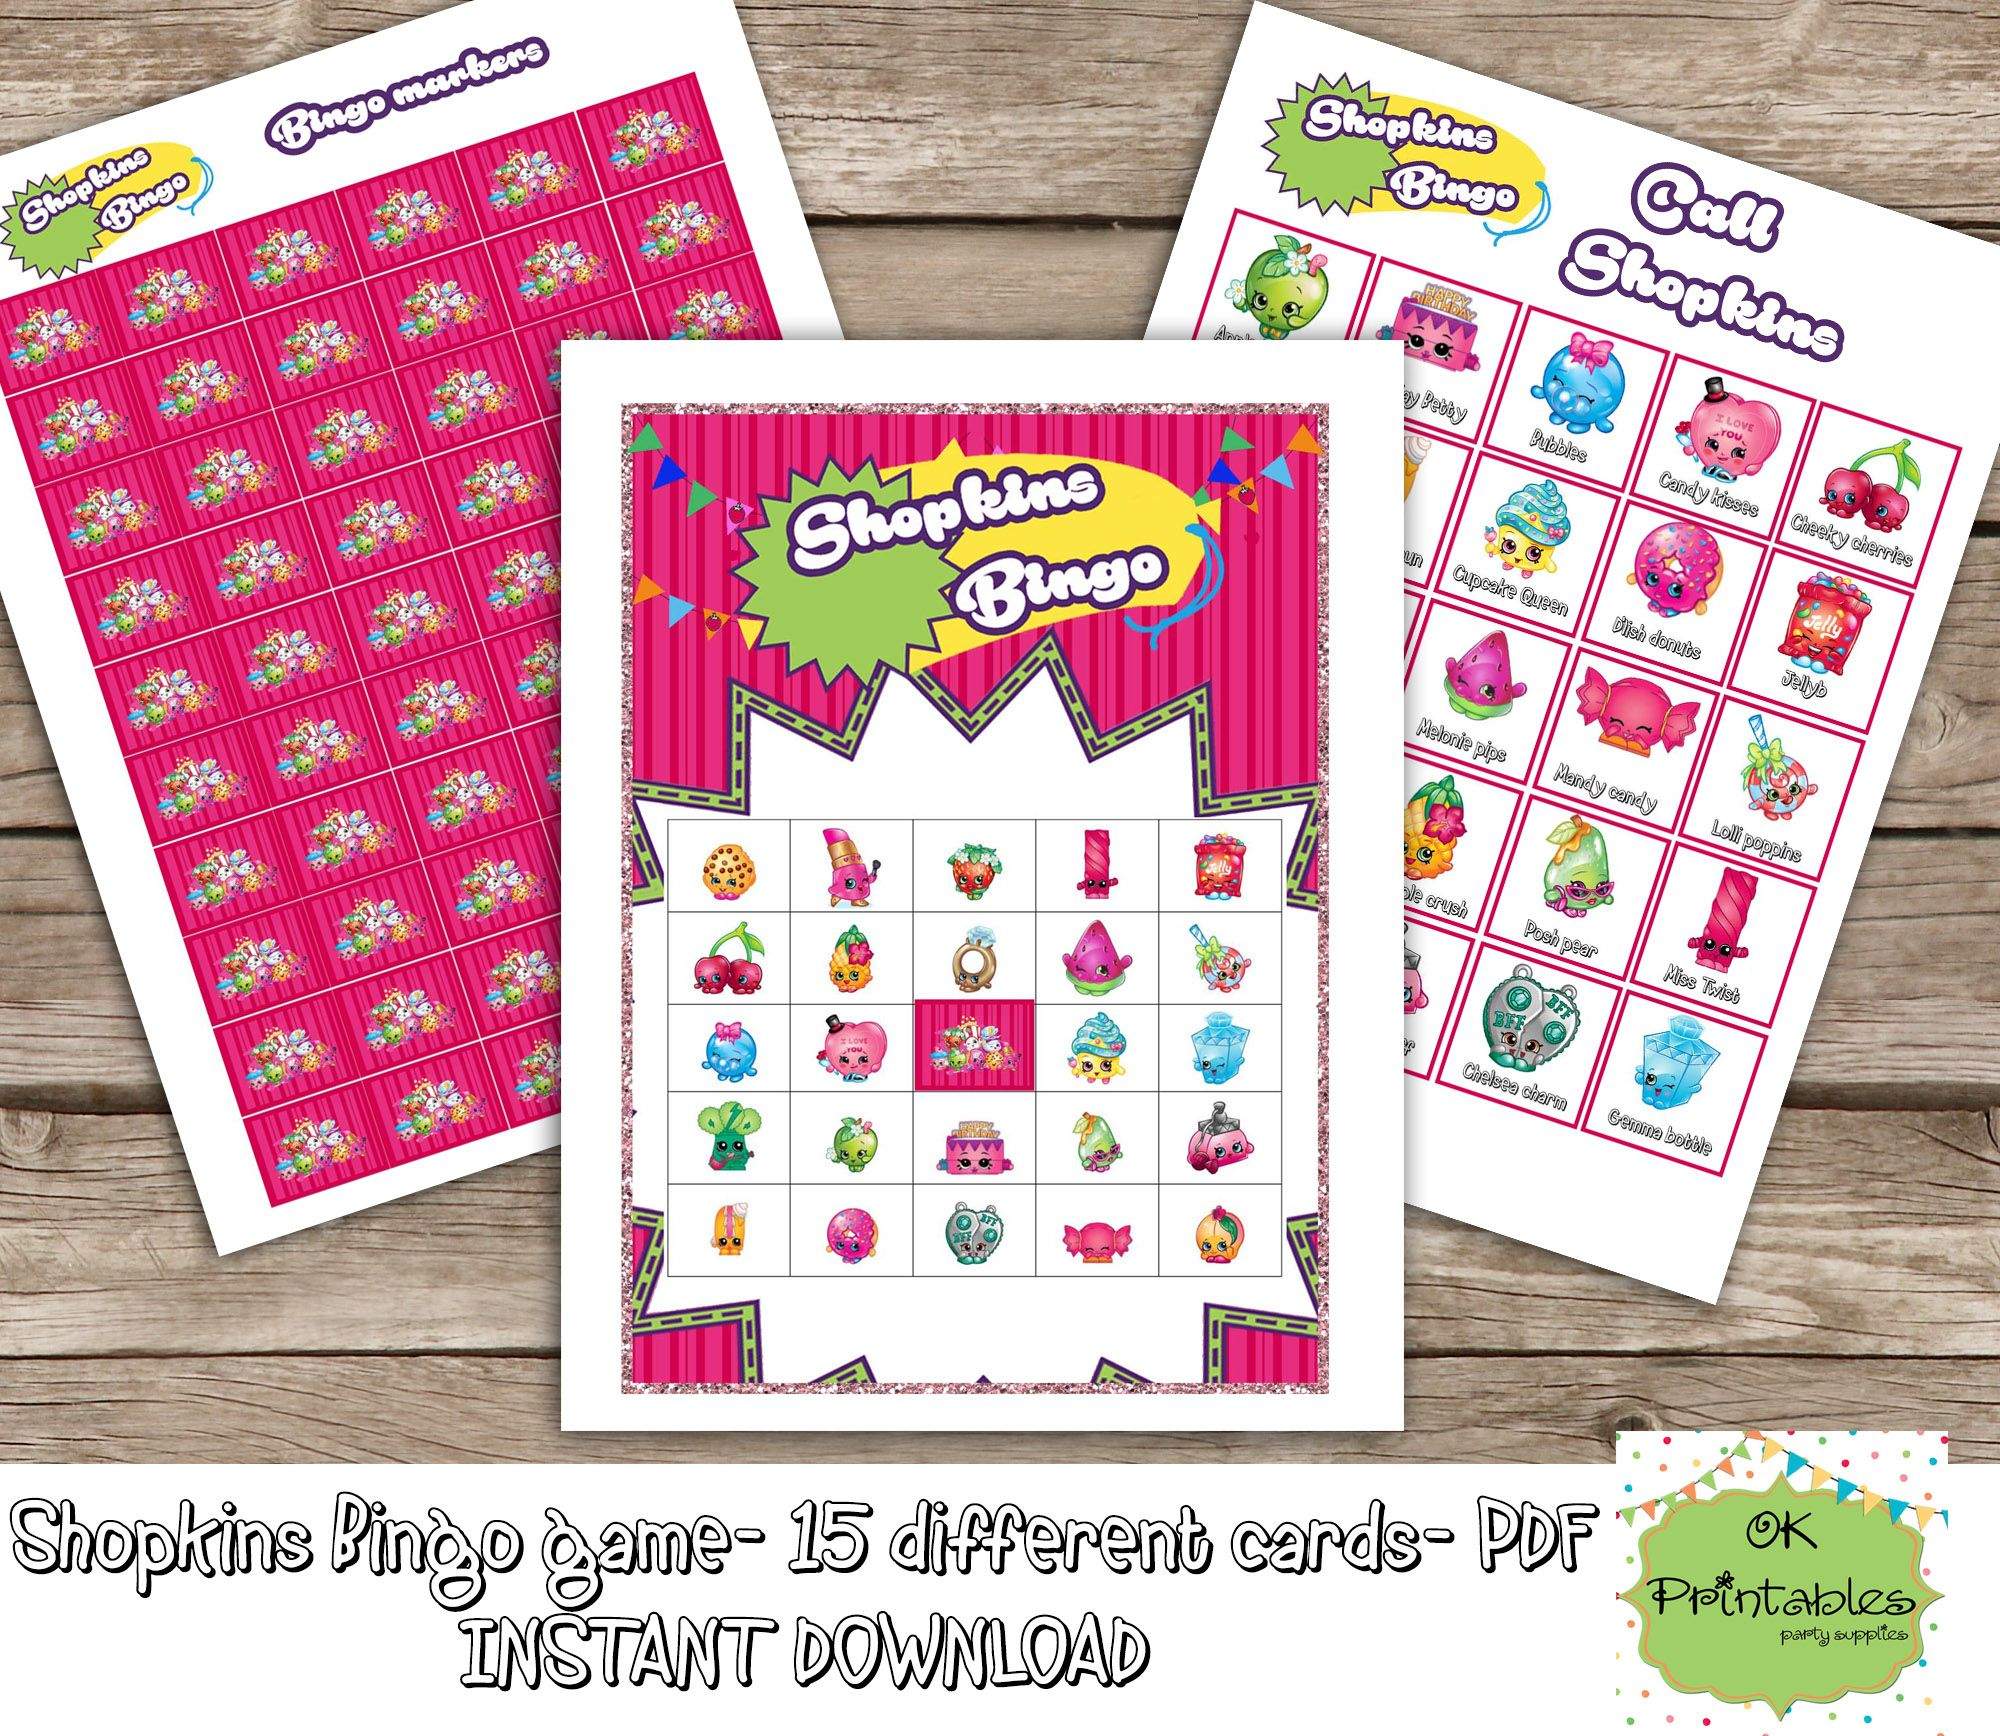 Shopkins Bingo Game (Include 15 Different Cards)- Shopkins